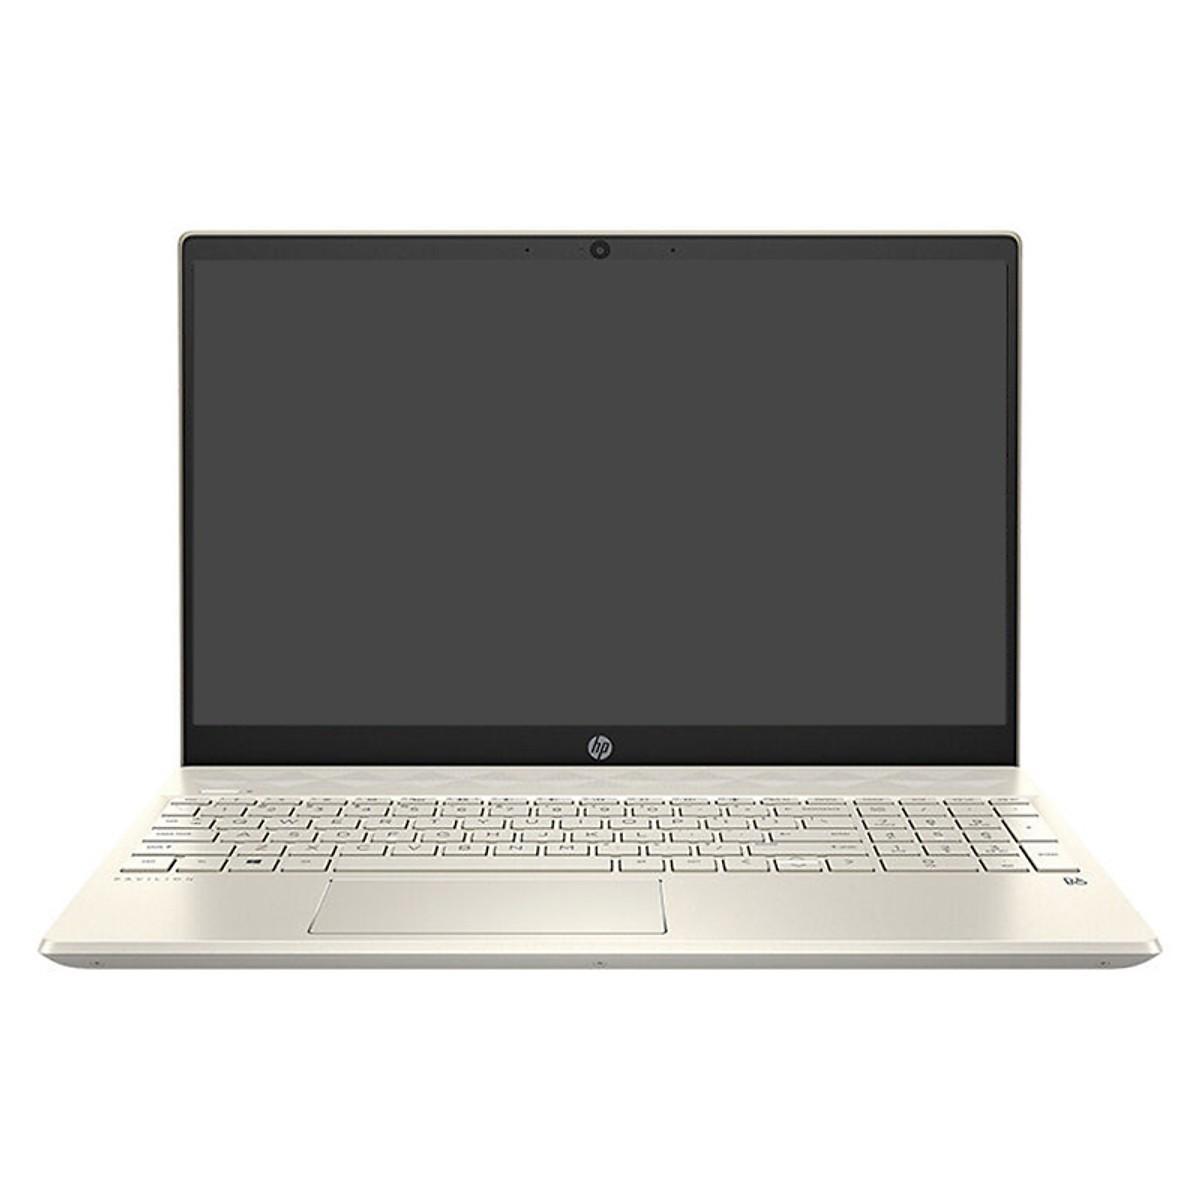 Laptop HP Pav 15-cs2055TX 6ZF22PA i5-8265U,4GD,1TB+128GSSD,15.6FHD,VGA 2G_MX130ALU,VÀNG/W10SL